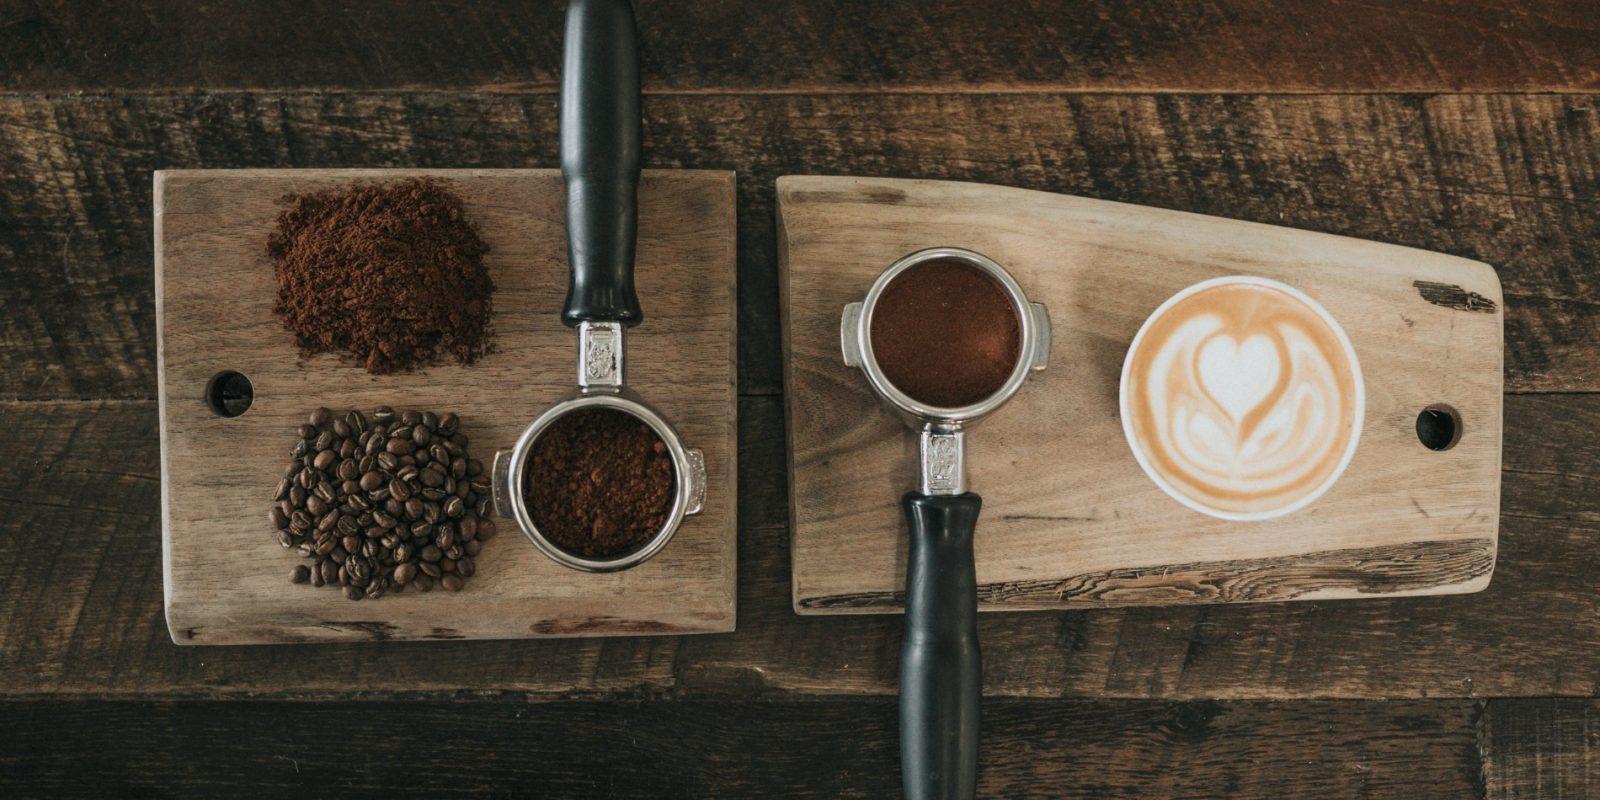 EGEB: Coffee grounds as green heating fuel, UK's first net-zero neighborhood, more